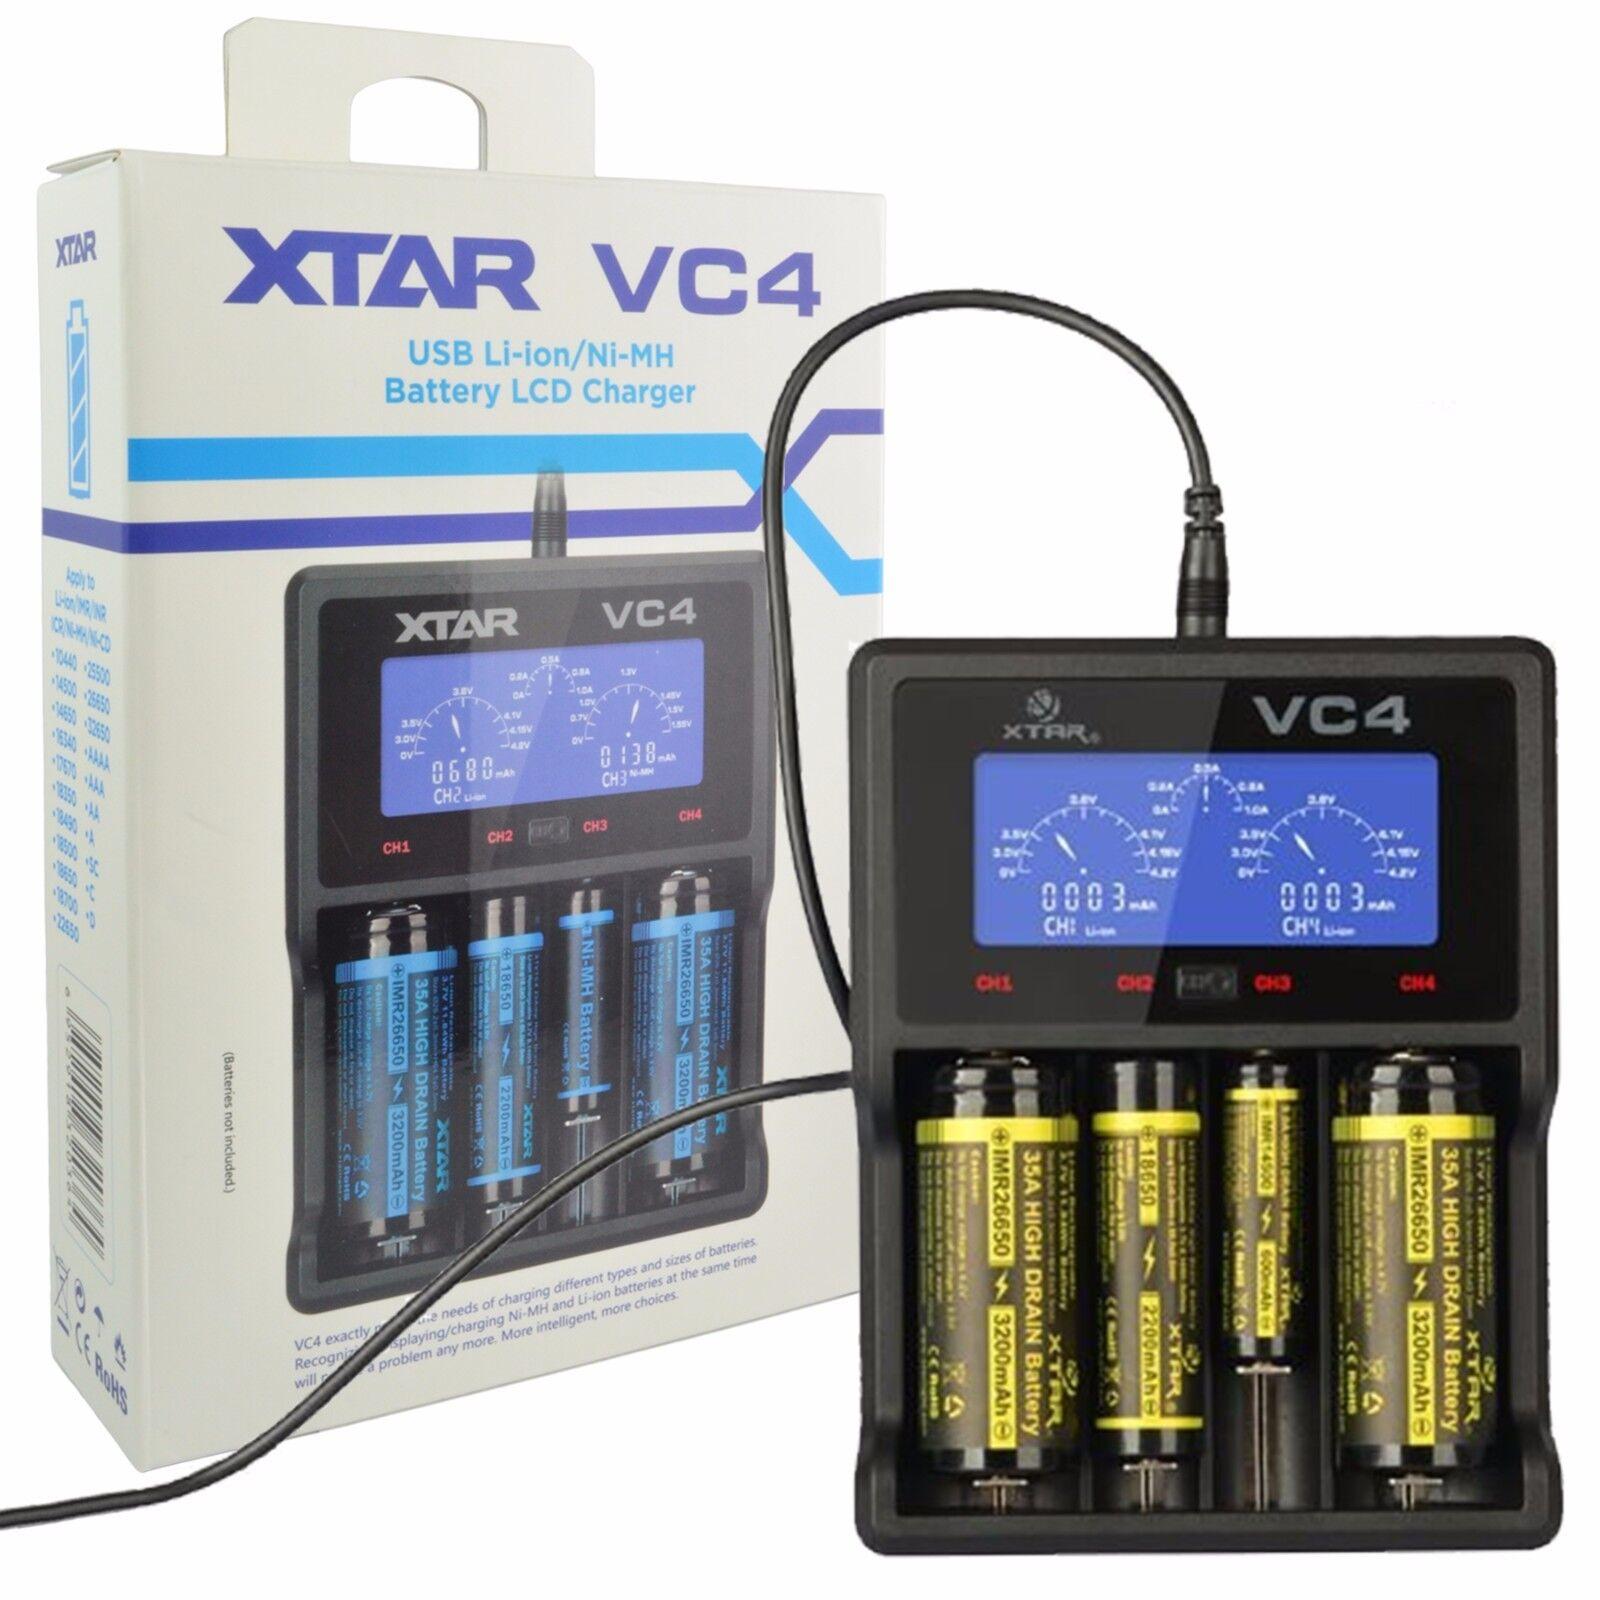 Xtar Battery Chargers For Sale Ebay Charger 1 Slot Baterai Vape Vc4 Usb Lcd Display Li Ion Ni Mh 14500 18650 26650 Aa